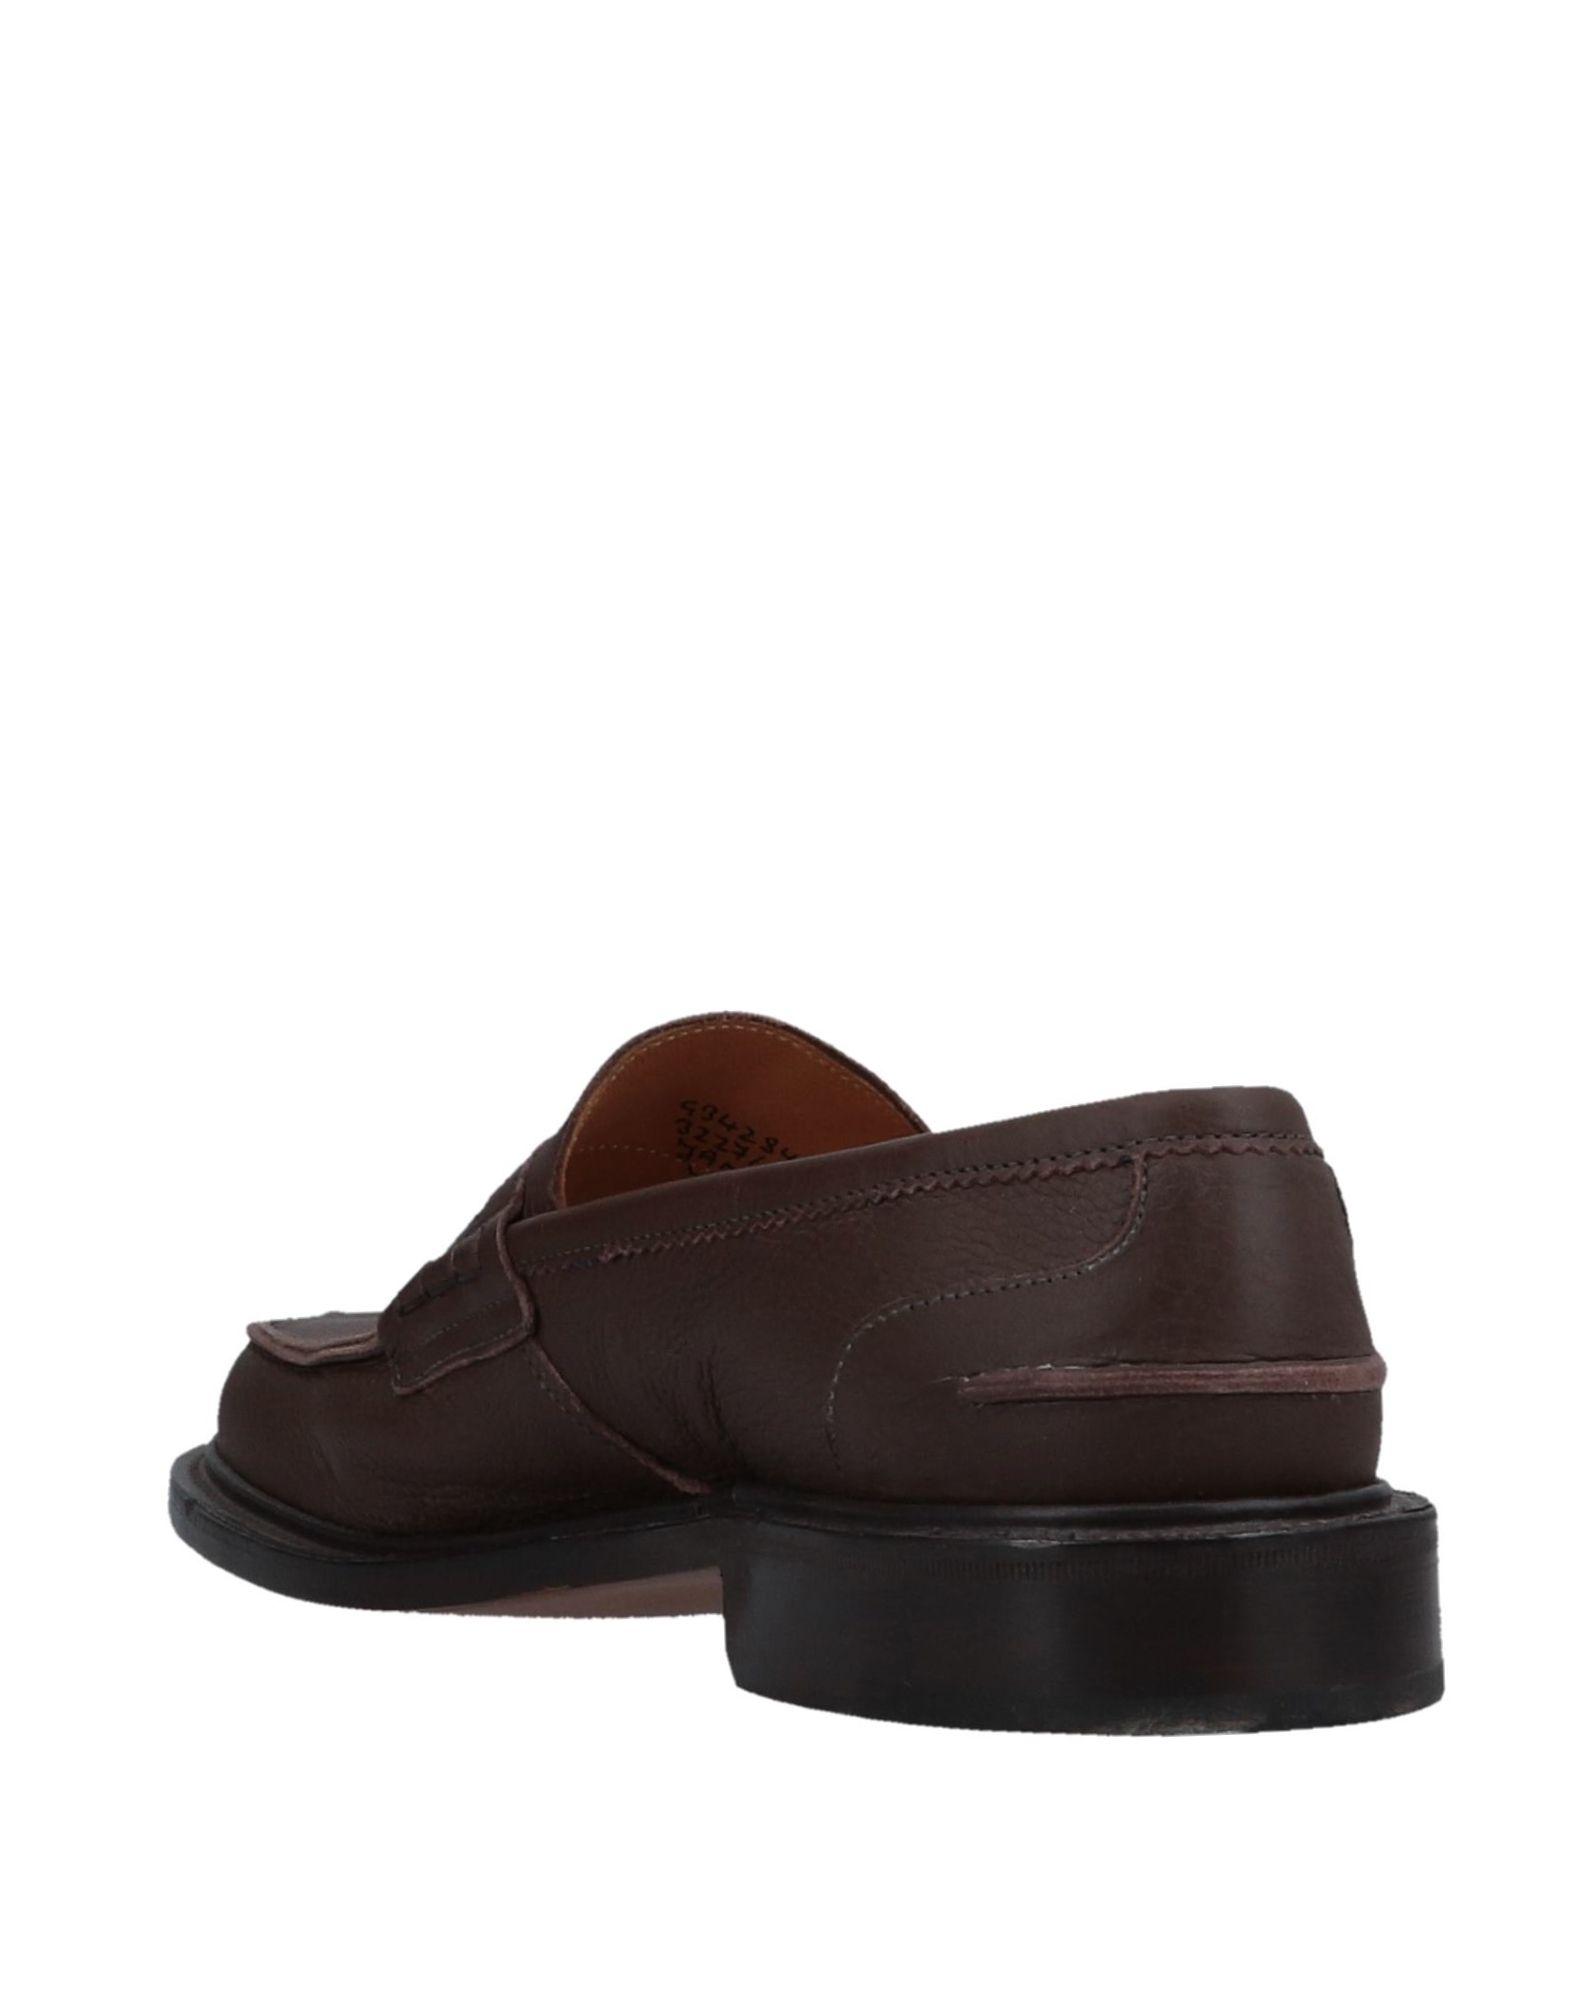 Tricker's Mokassins Schuhe Herren  11511555TR Heiße Schuhe Mokassins 27c78f